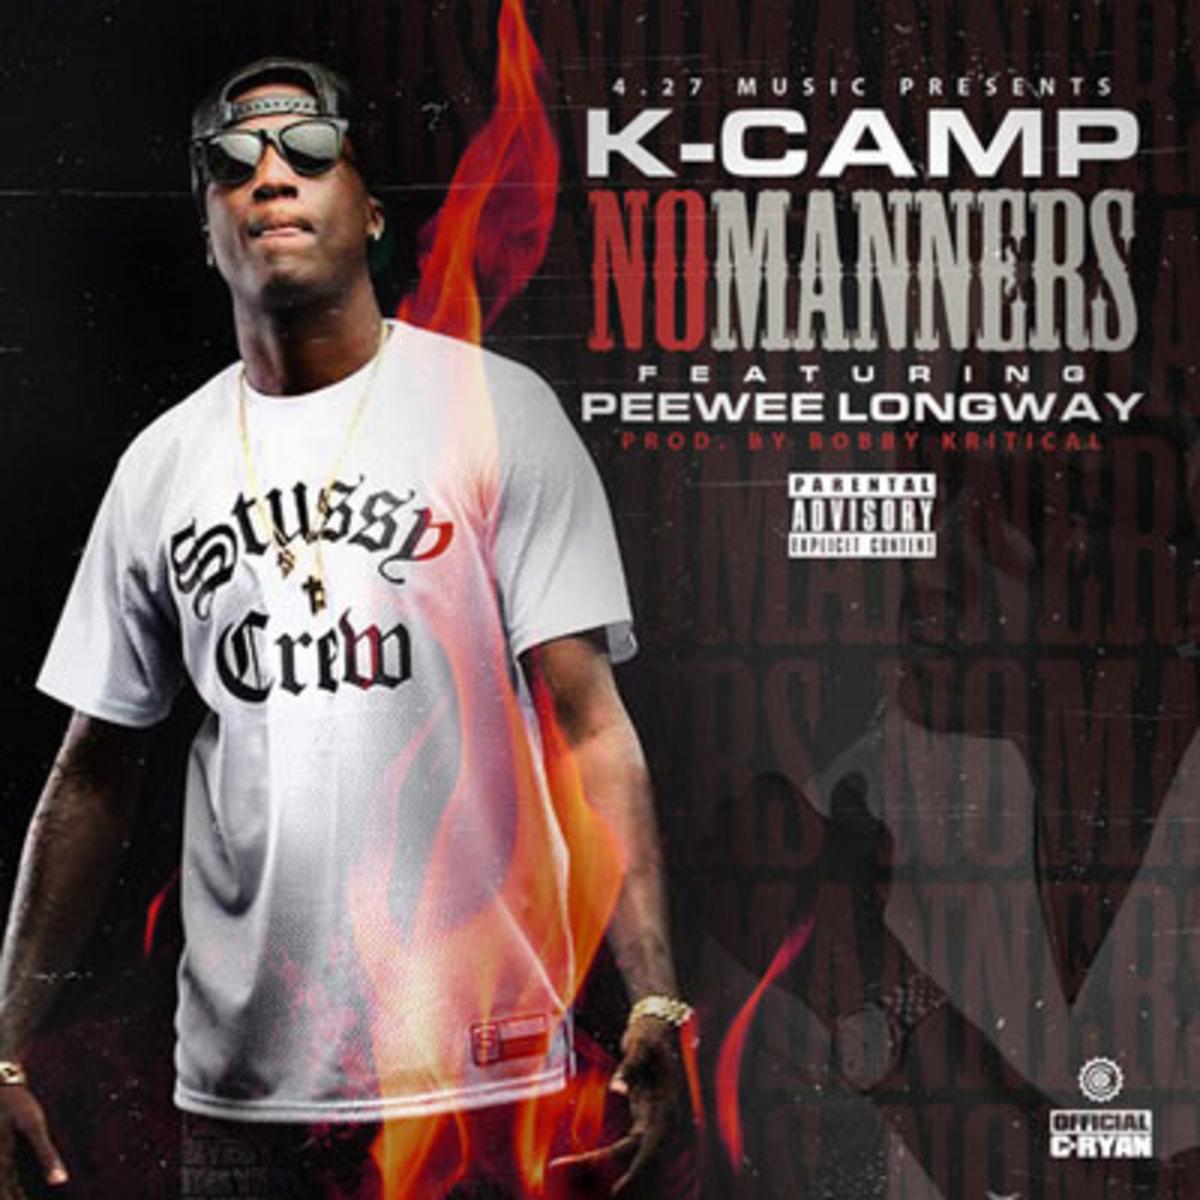 kcamp-nomanners.jpg